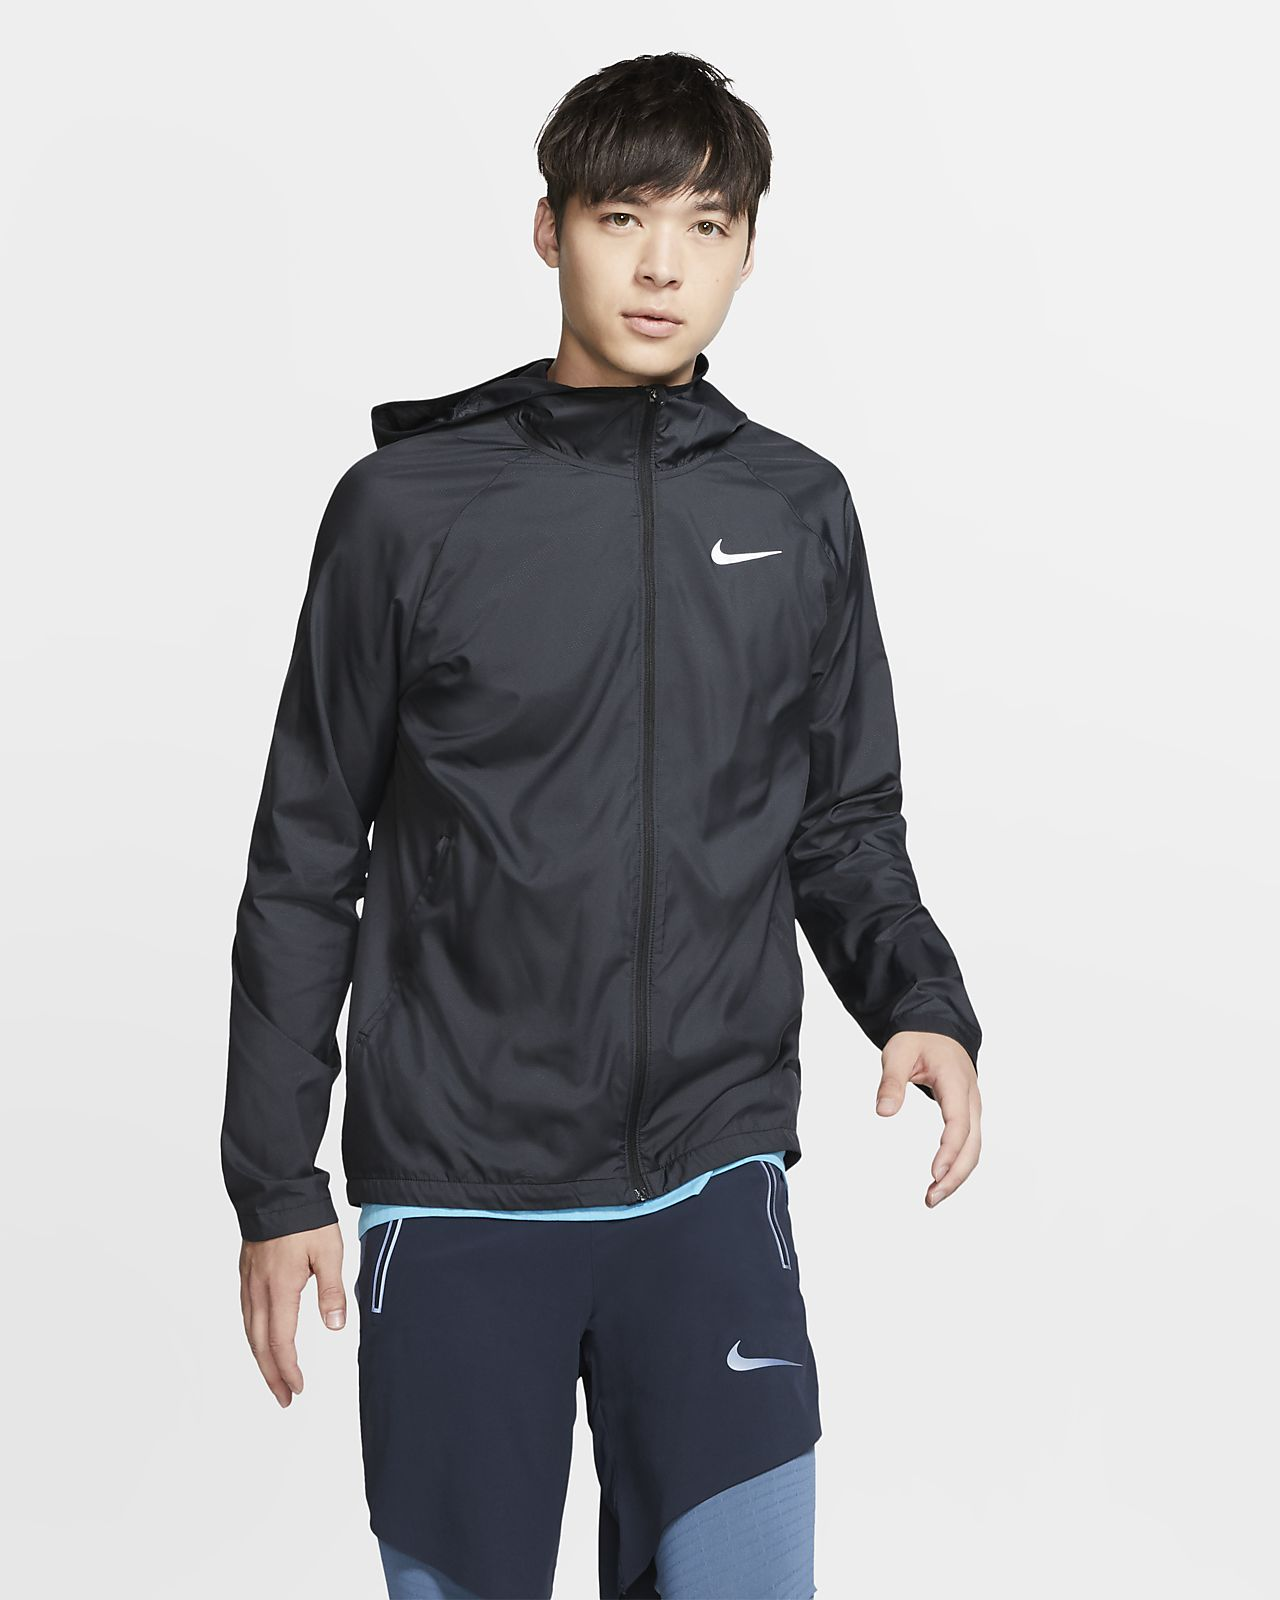 Nike Essential Hardloopjack met capuchon voor heren